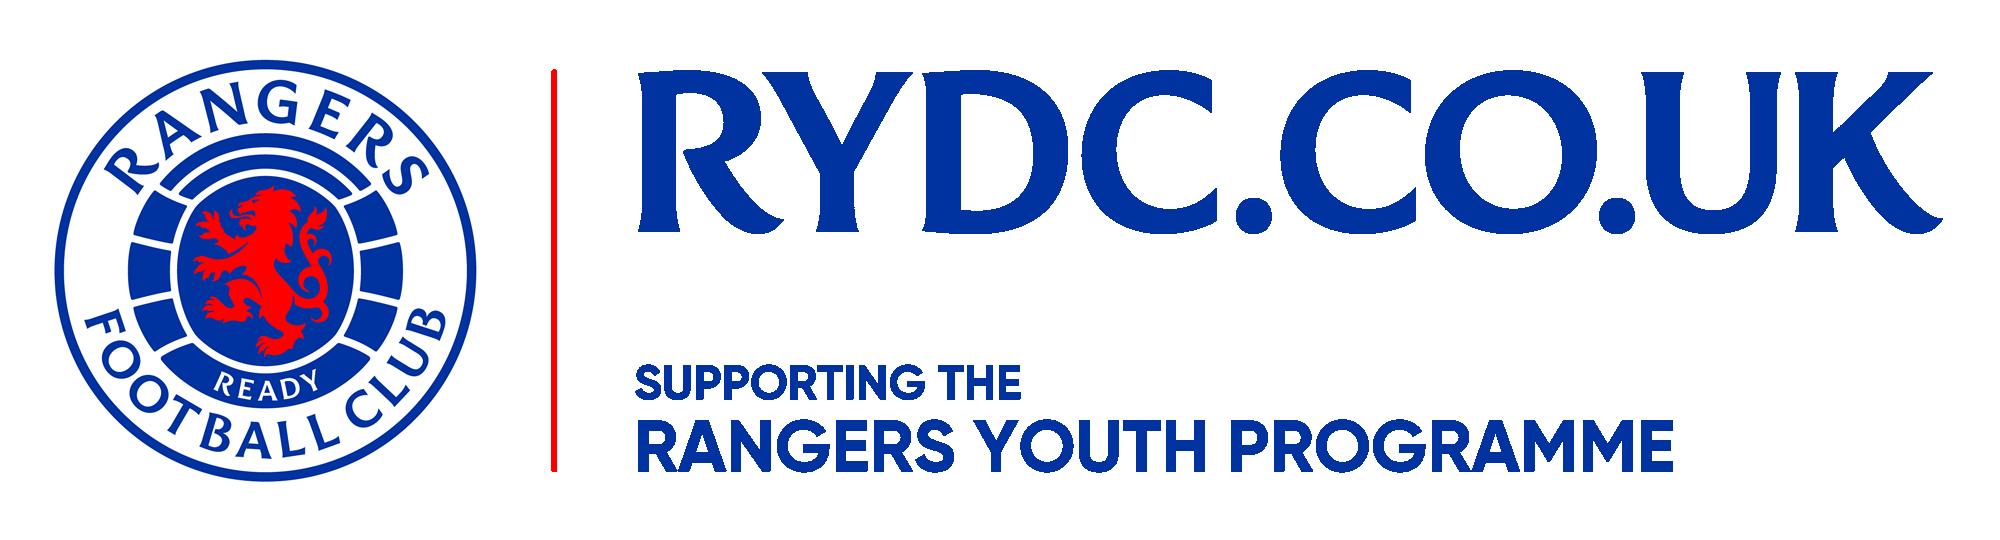 Rangers Youth Development Company